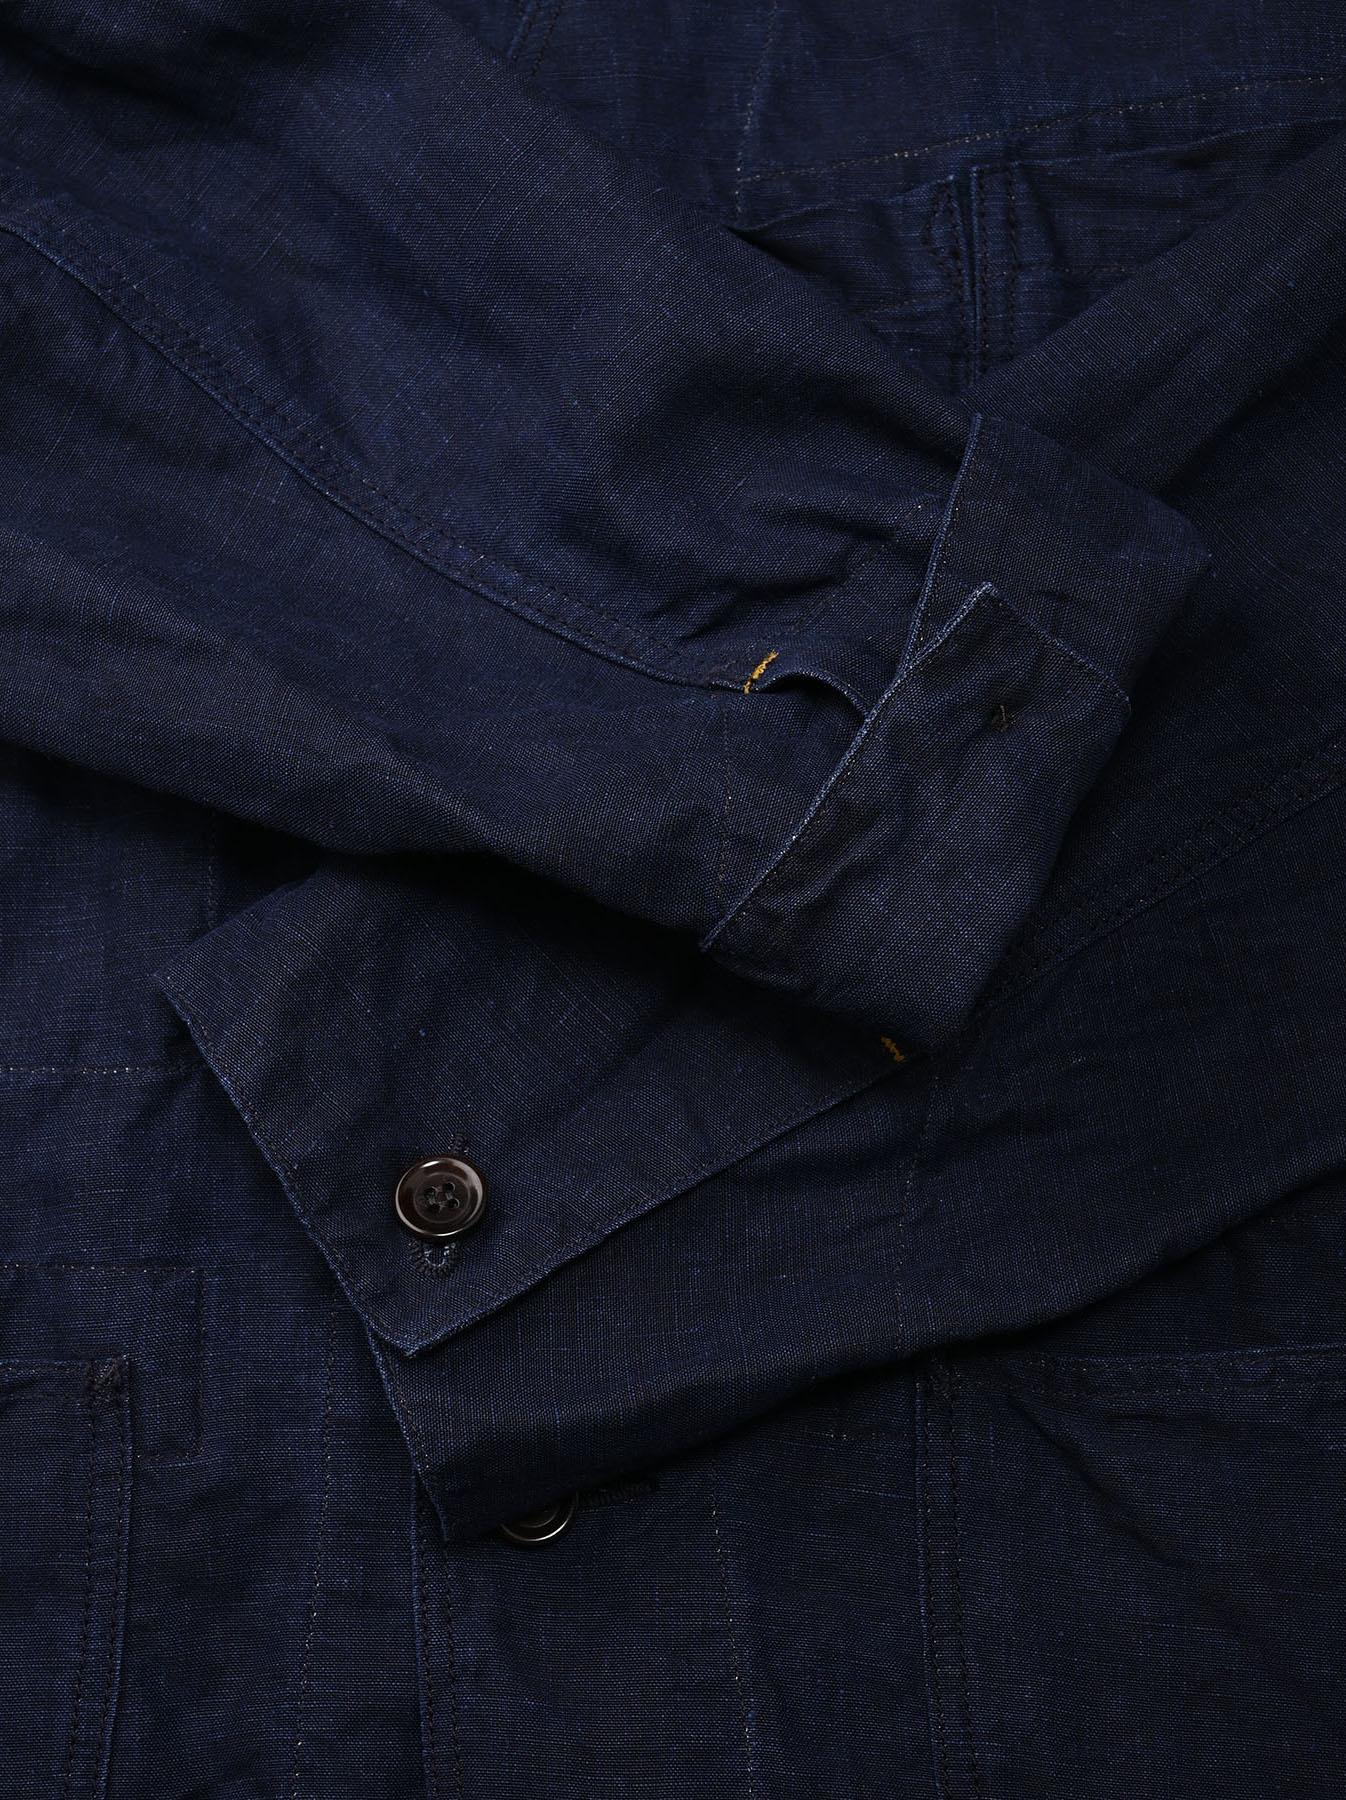 Indigo Linen 908 V-neck Coverall (0421)-11